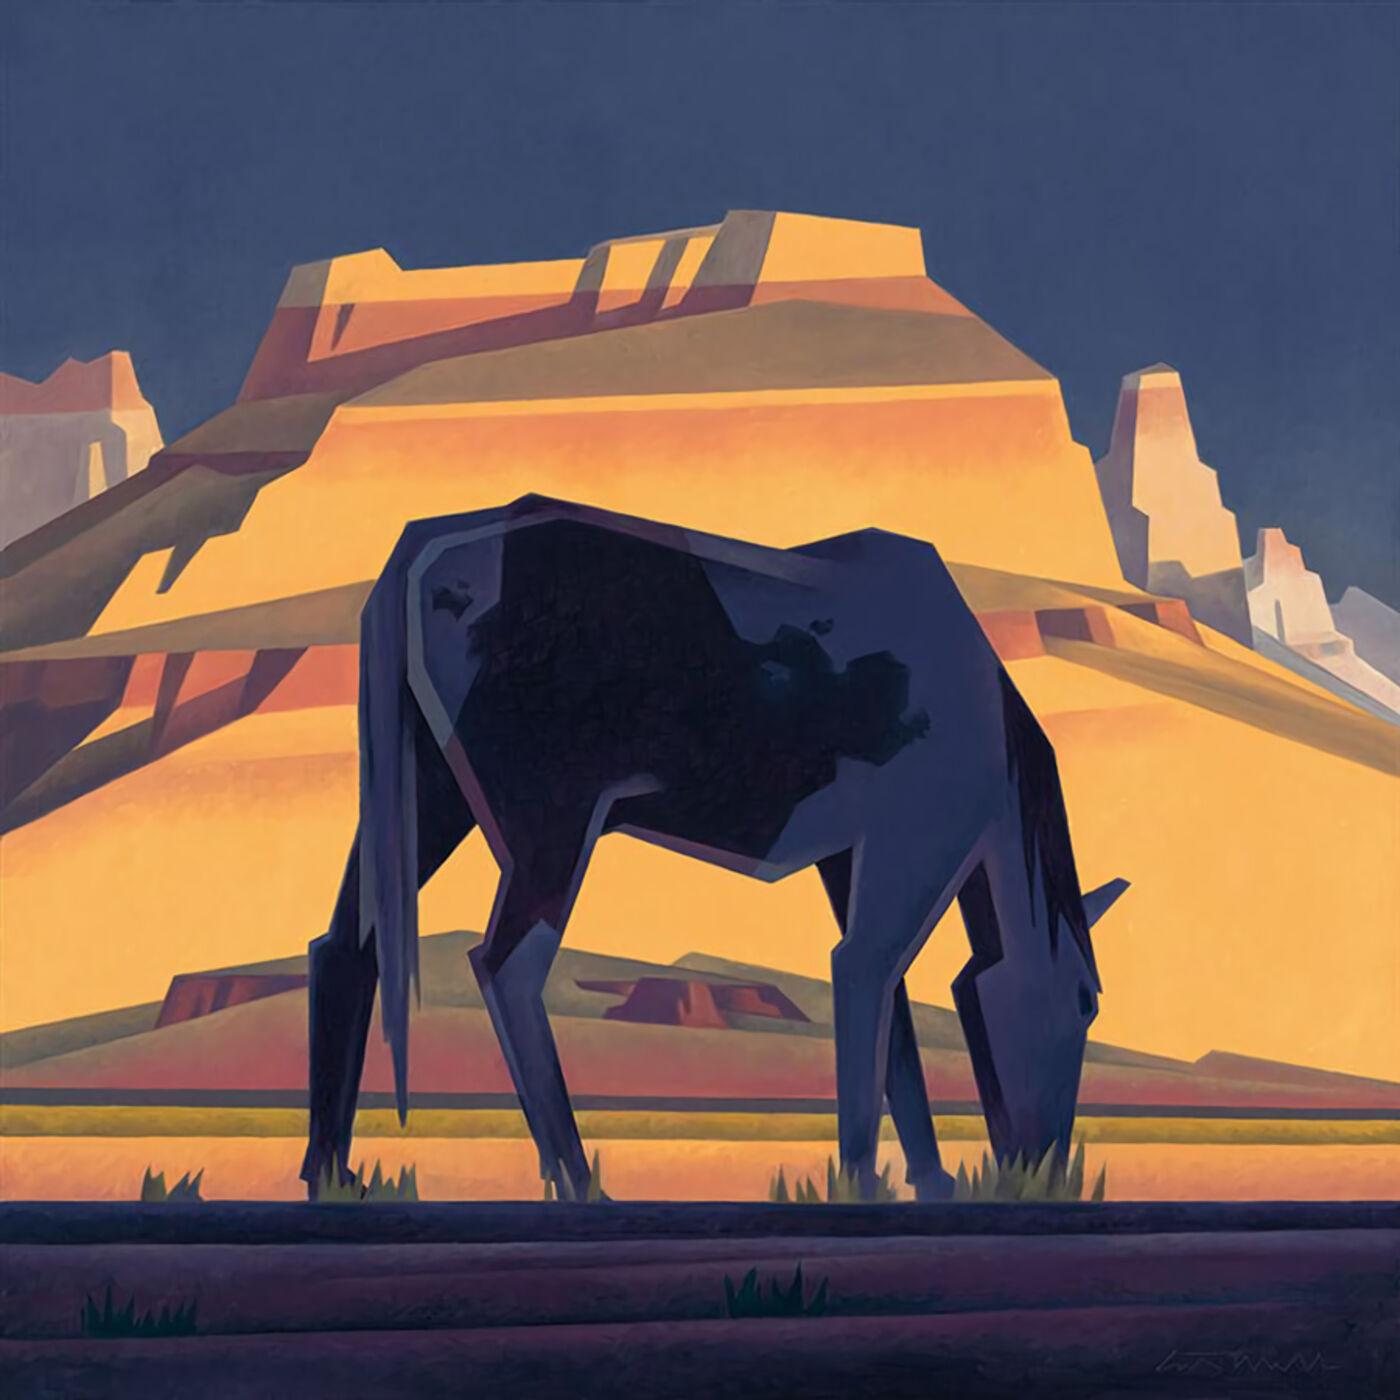 Ed Mell: Celebrated Arizona Artist (Part Two) - Epi. 153, Host Dr. Mark Sublette